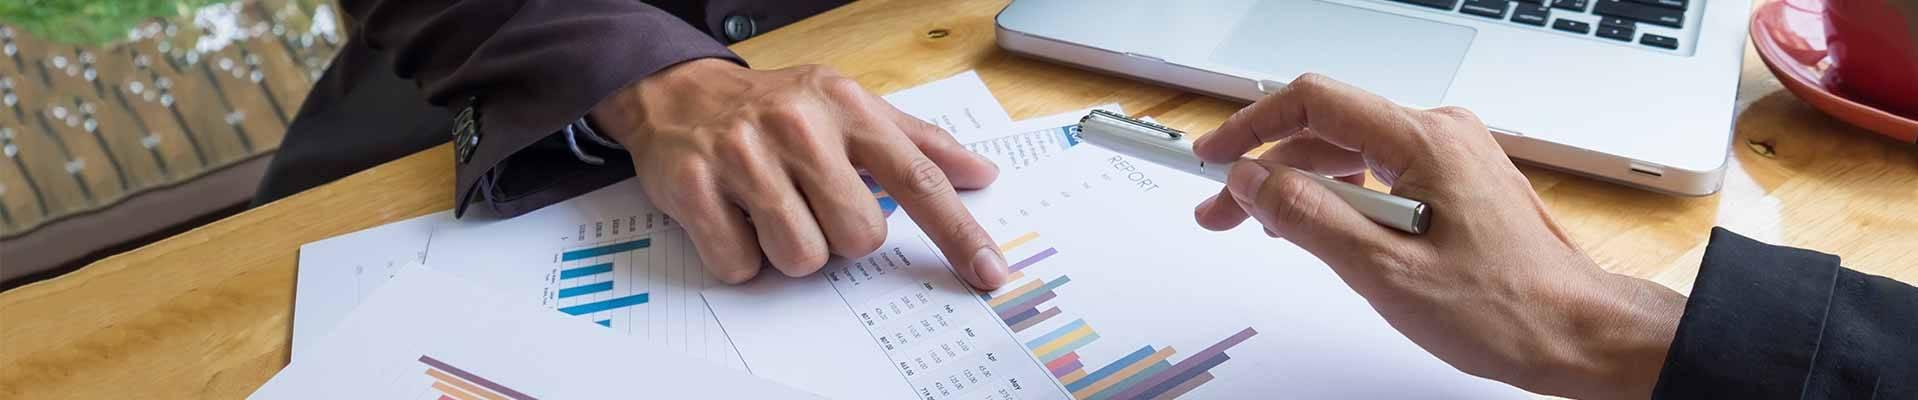 Digital Marketing, SEO  & Advertising Plans